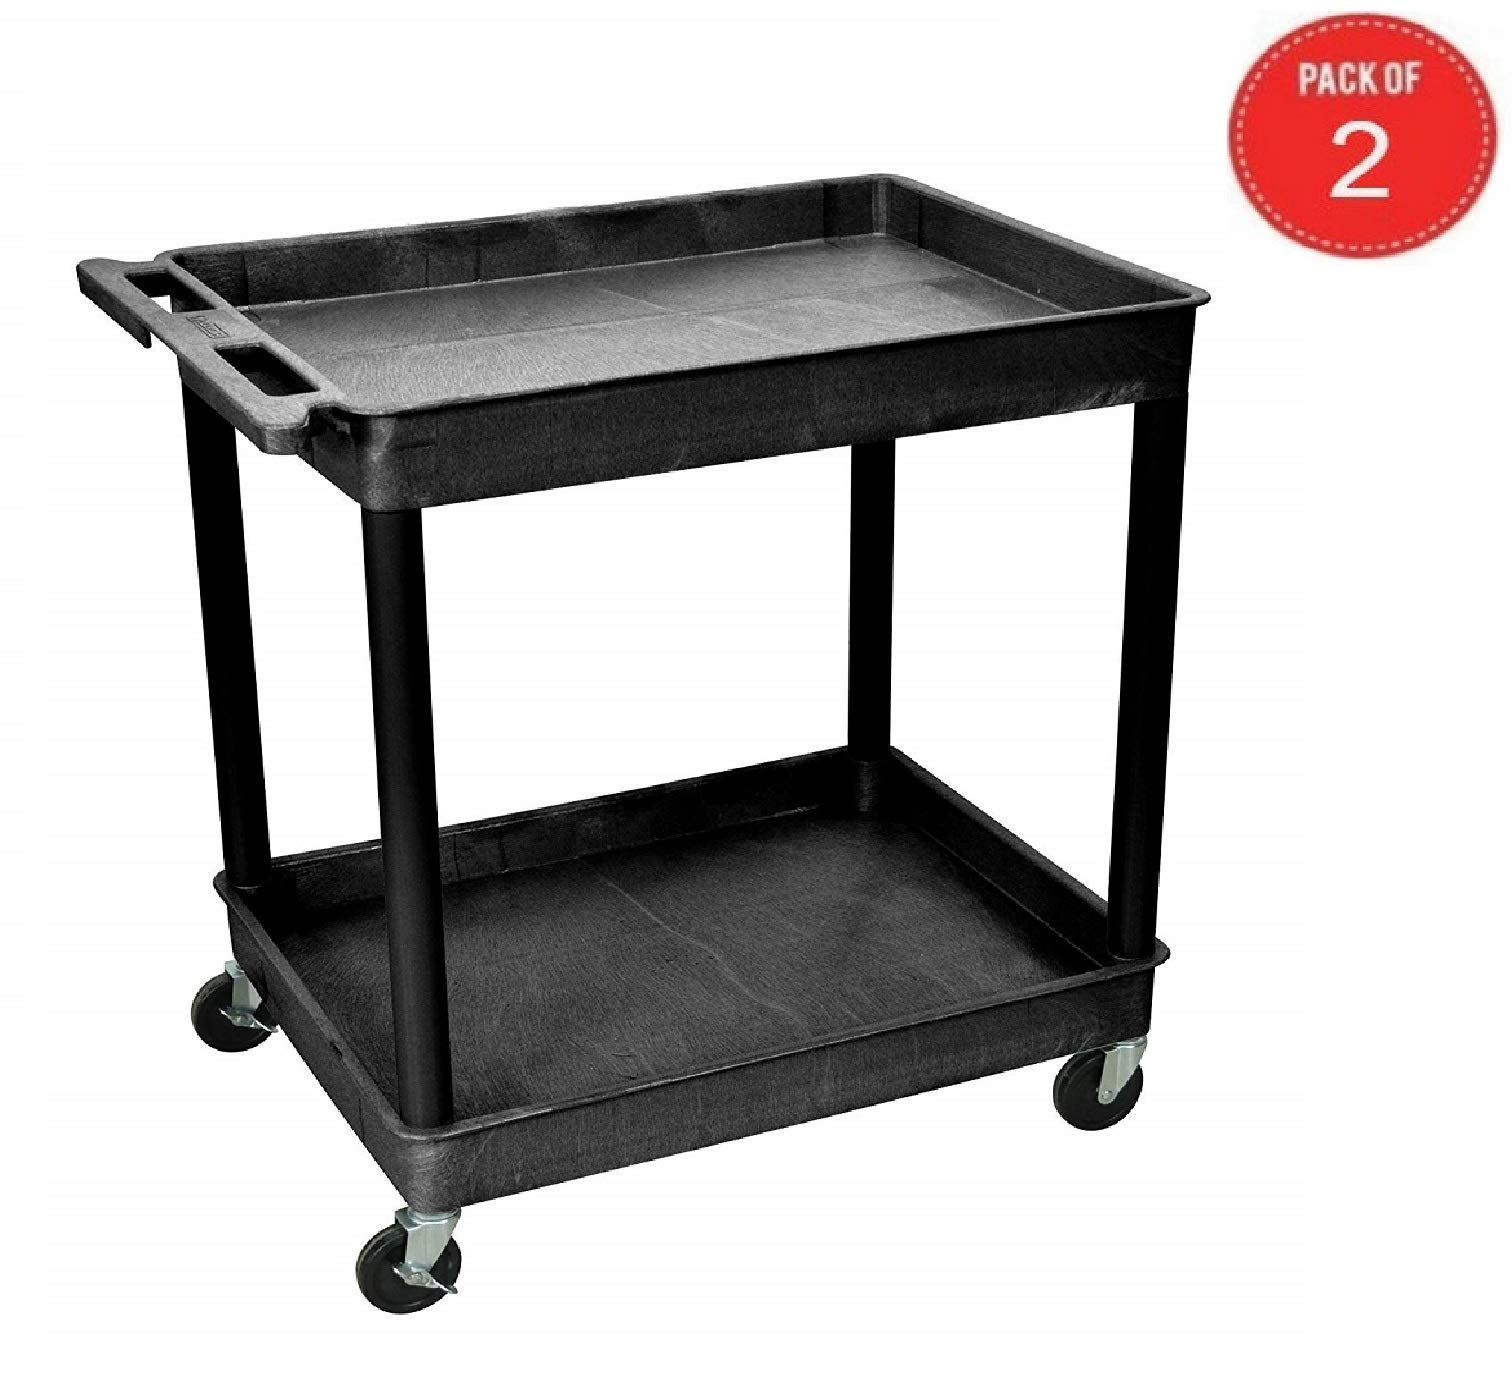 2 Shelf Large Tub Cart (Black- Pack of 2)